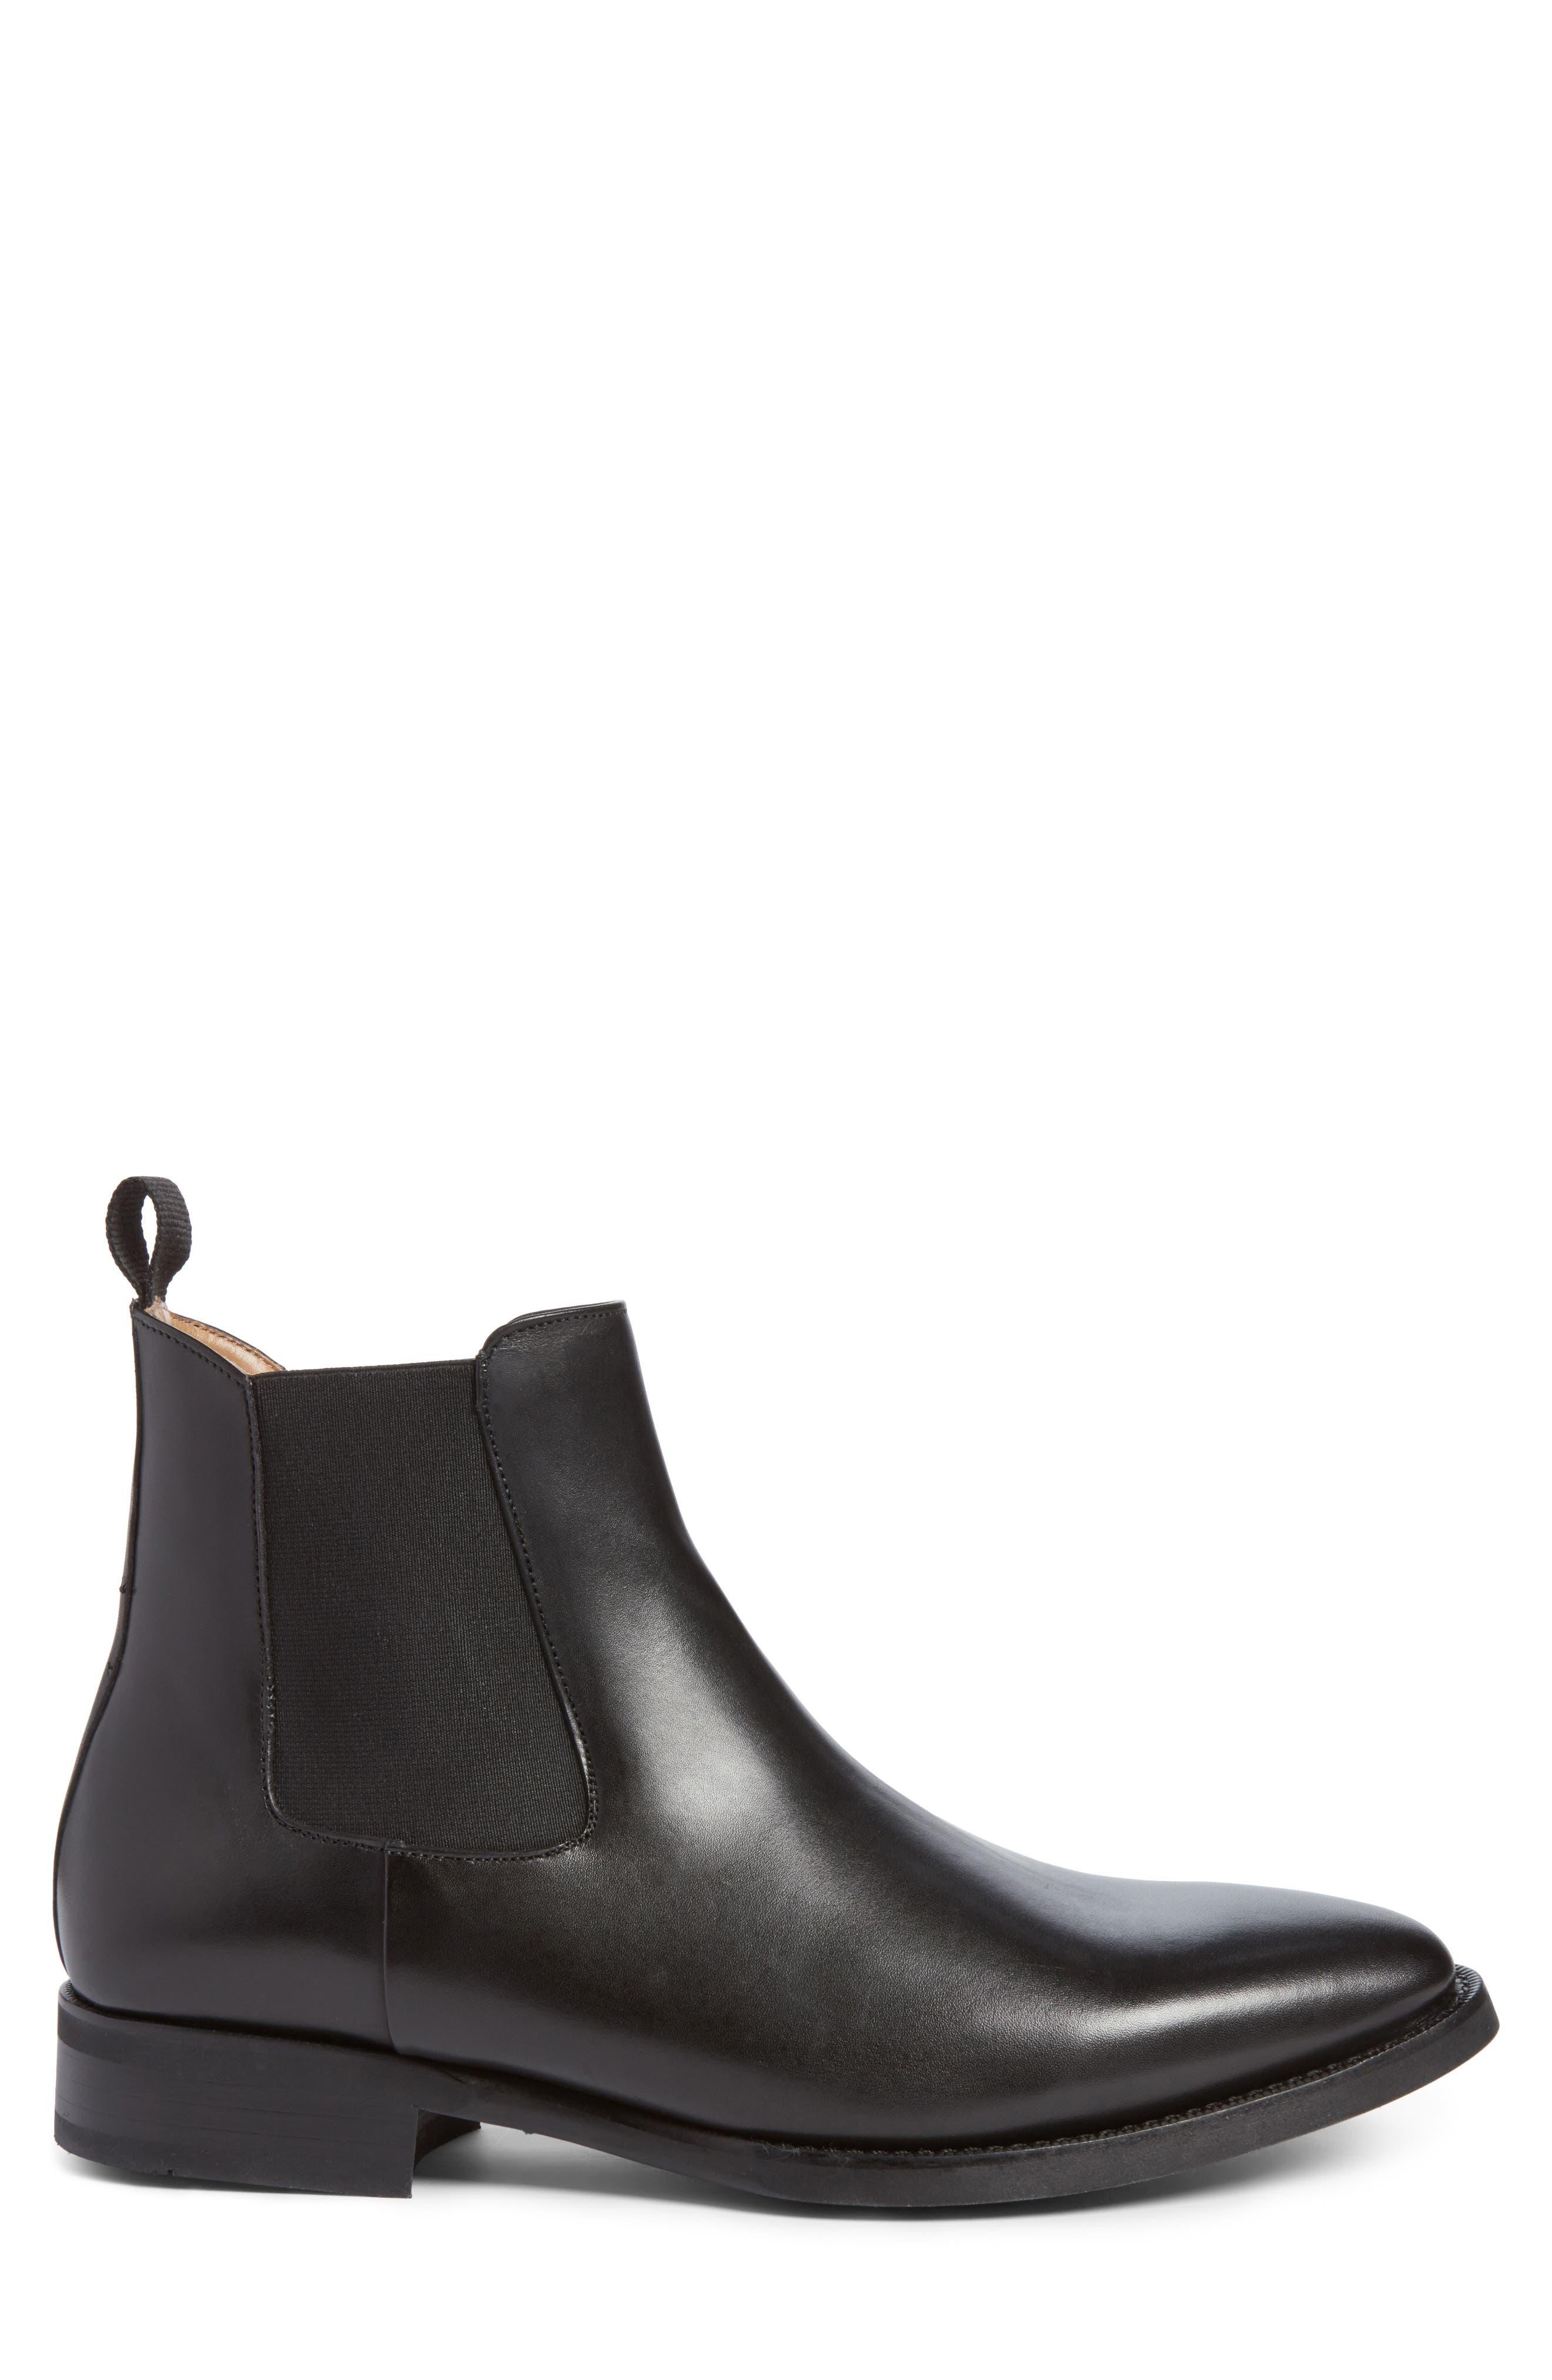 Ellis Water Resistant Chelsea Boot,                             Alternate thumbnail 3, color,                             Black Leather